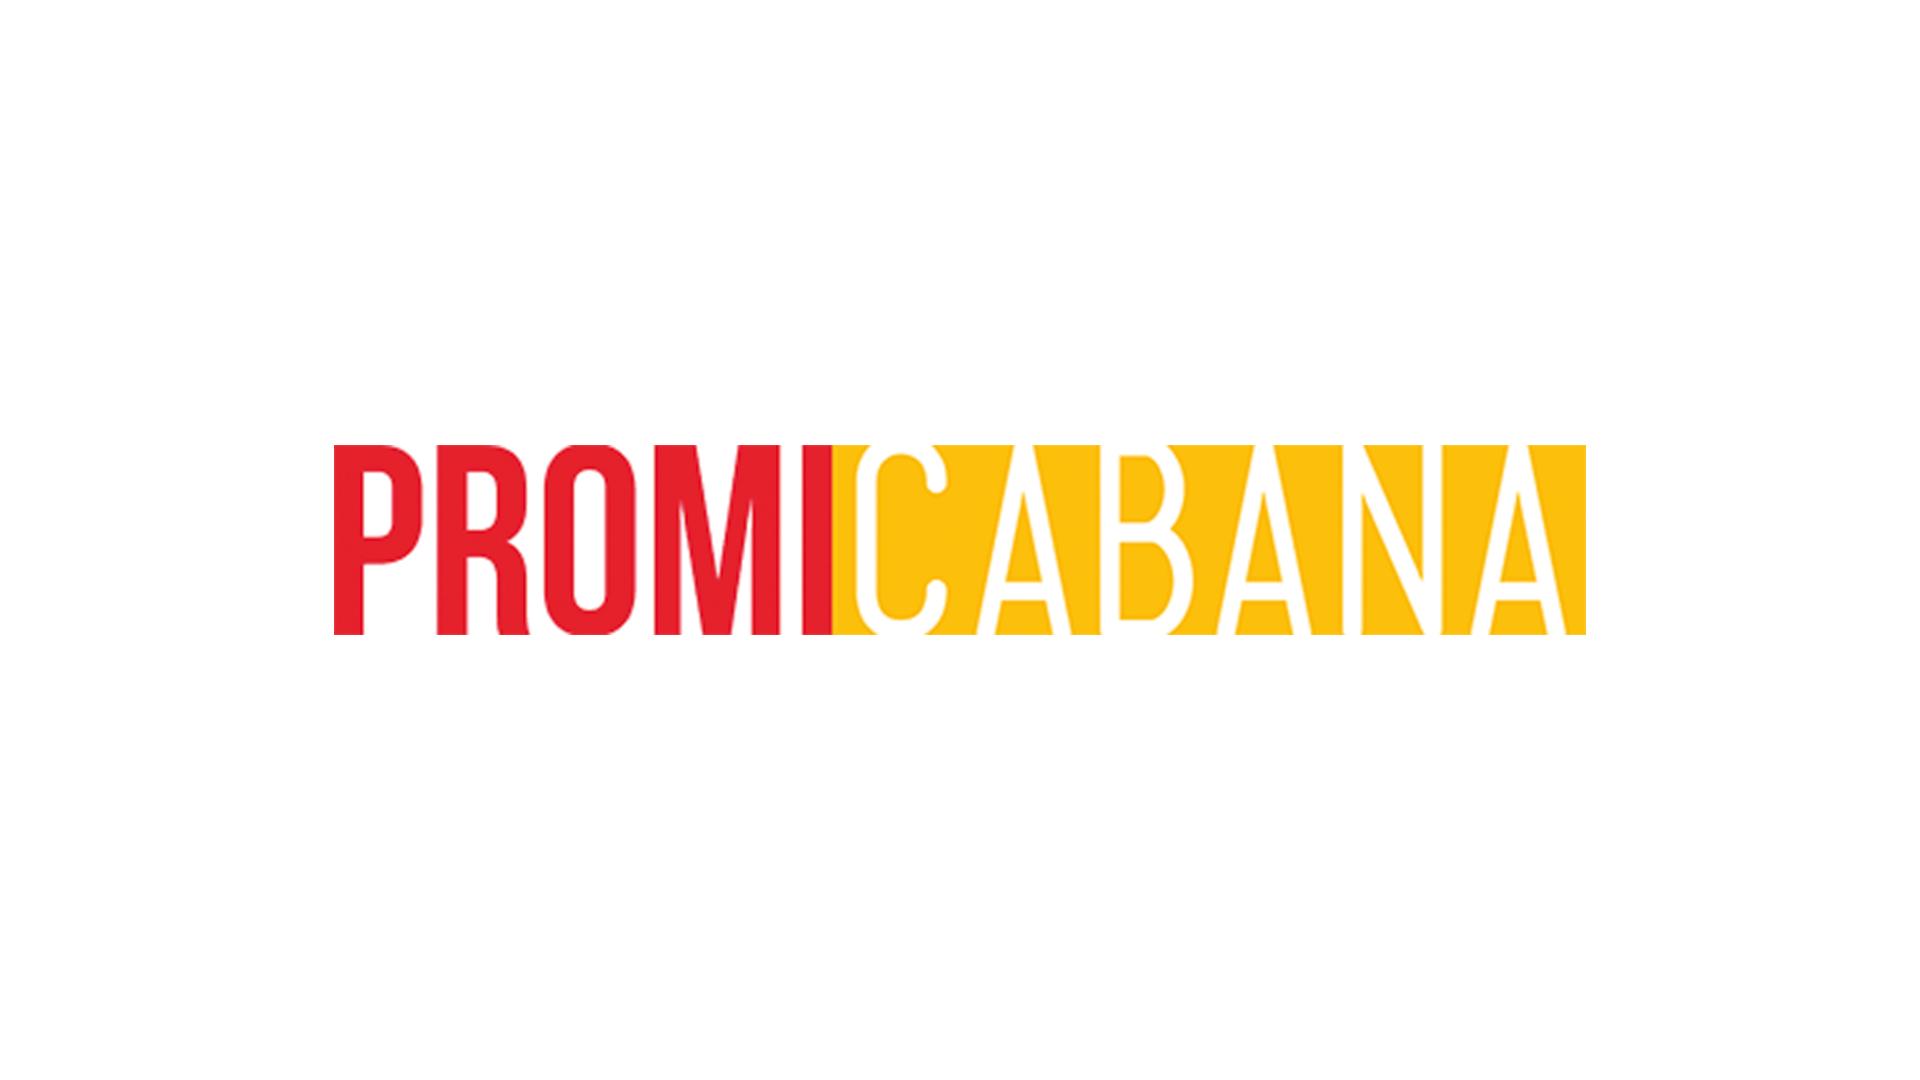 Christina-Aguilera-Steven-Tyler-Hurrikan-Sandy-Spendenmarathon